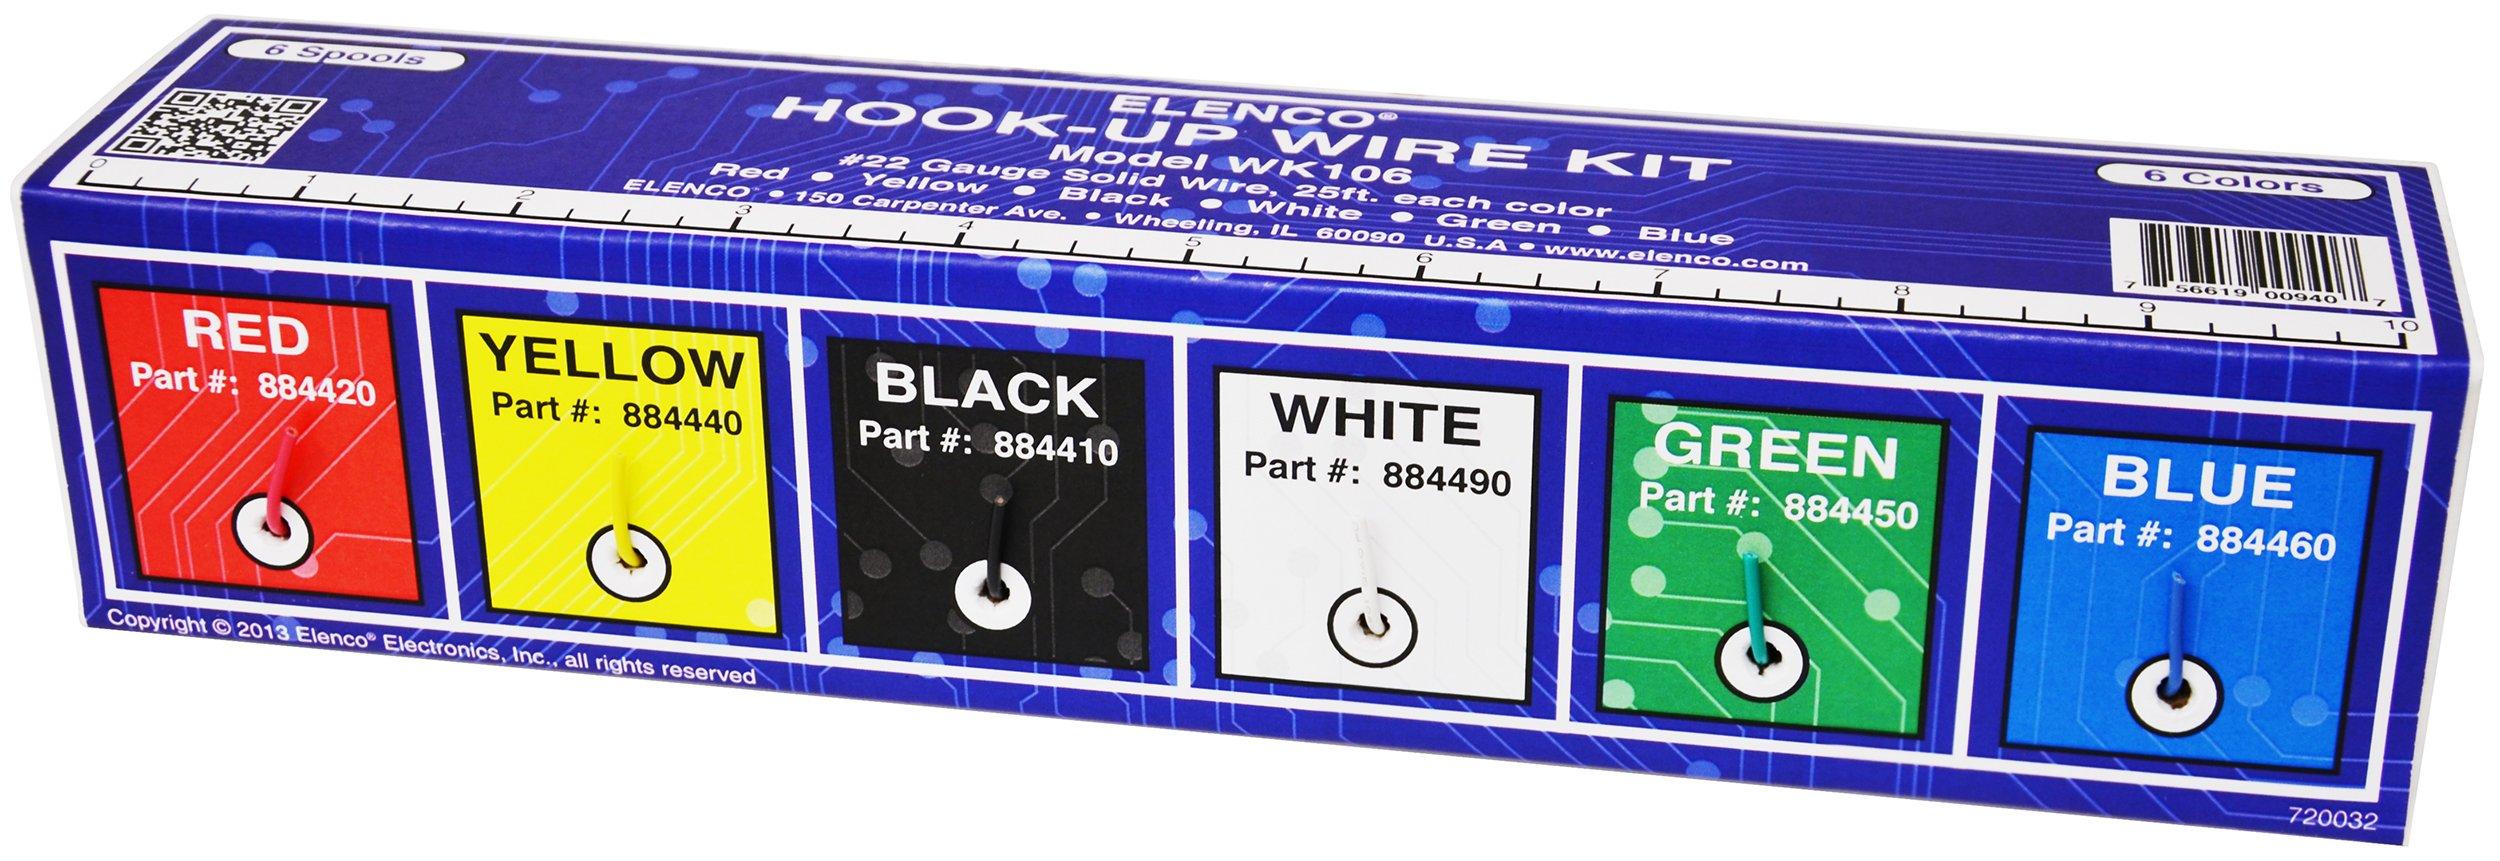 elenco hook colors dispenser blqjas